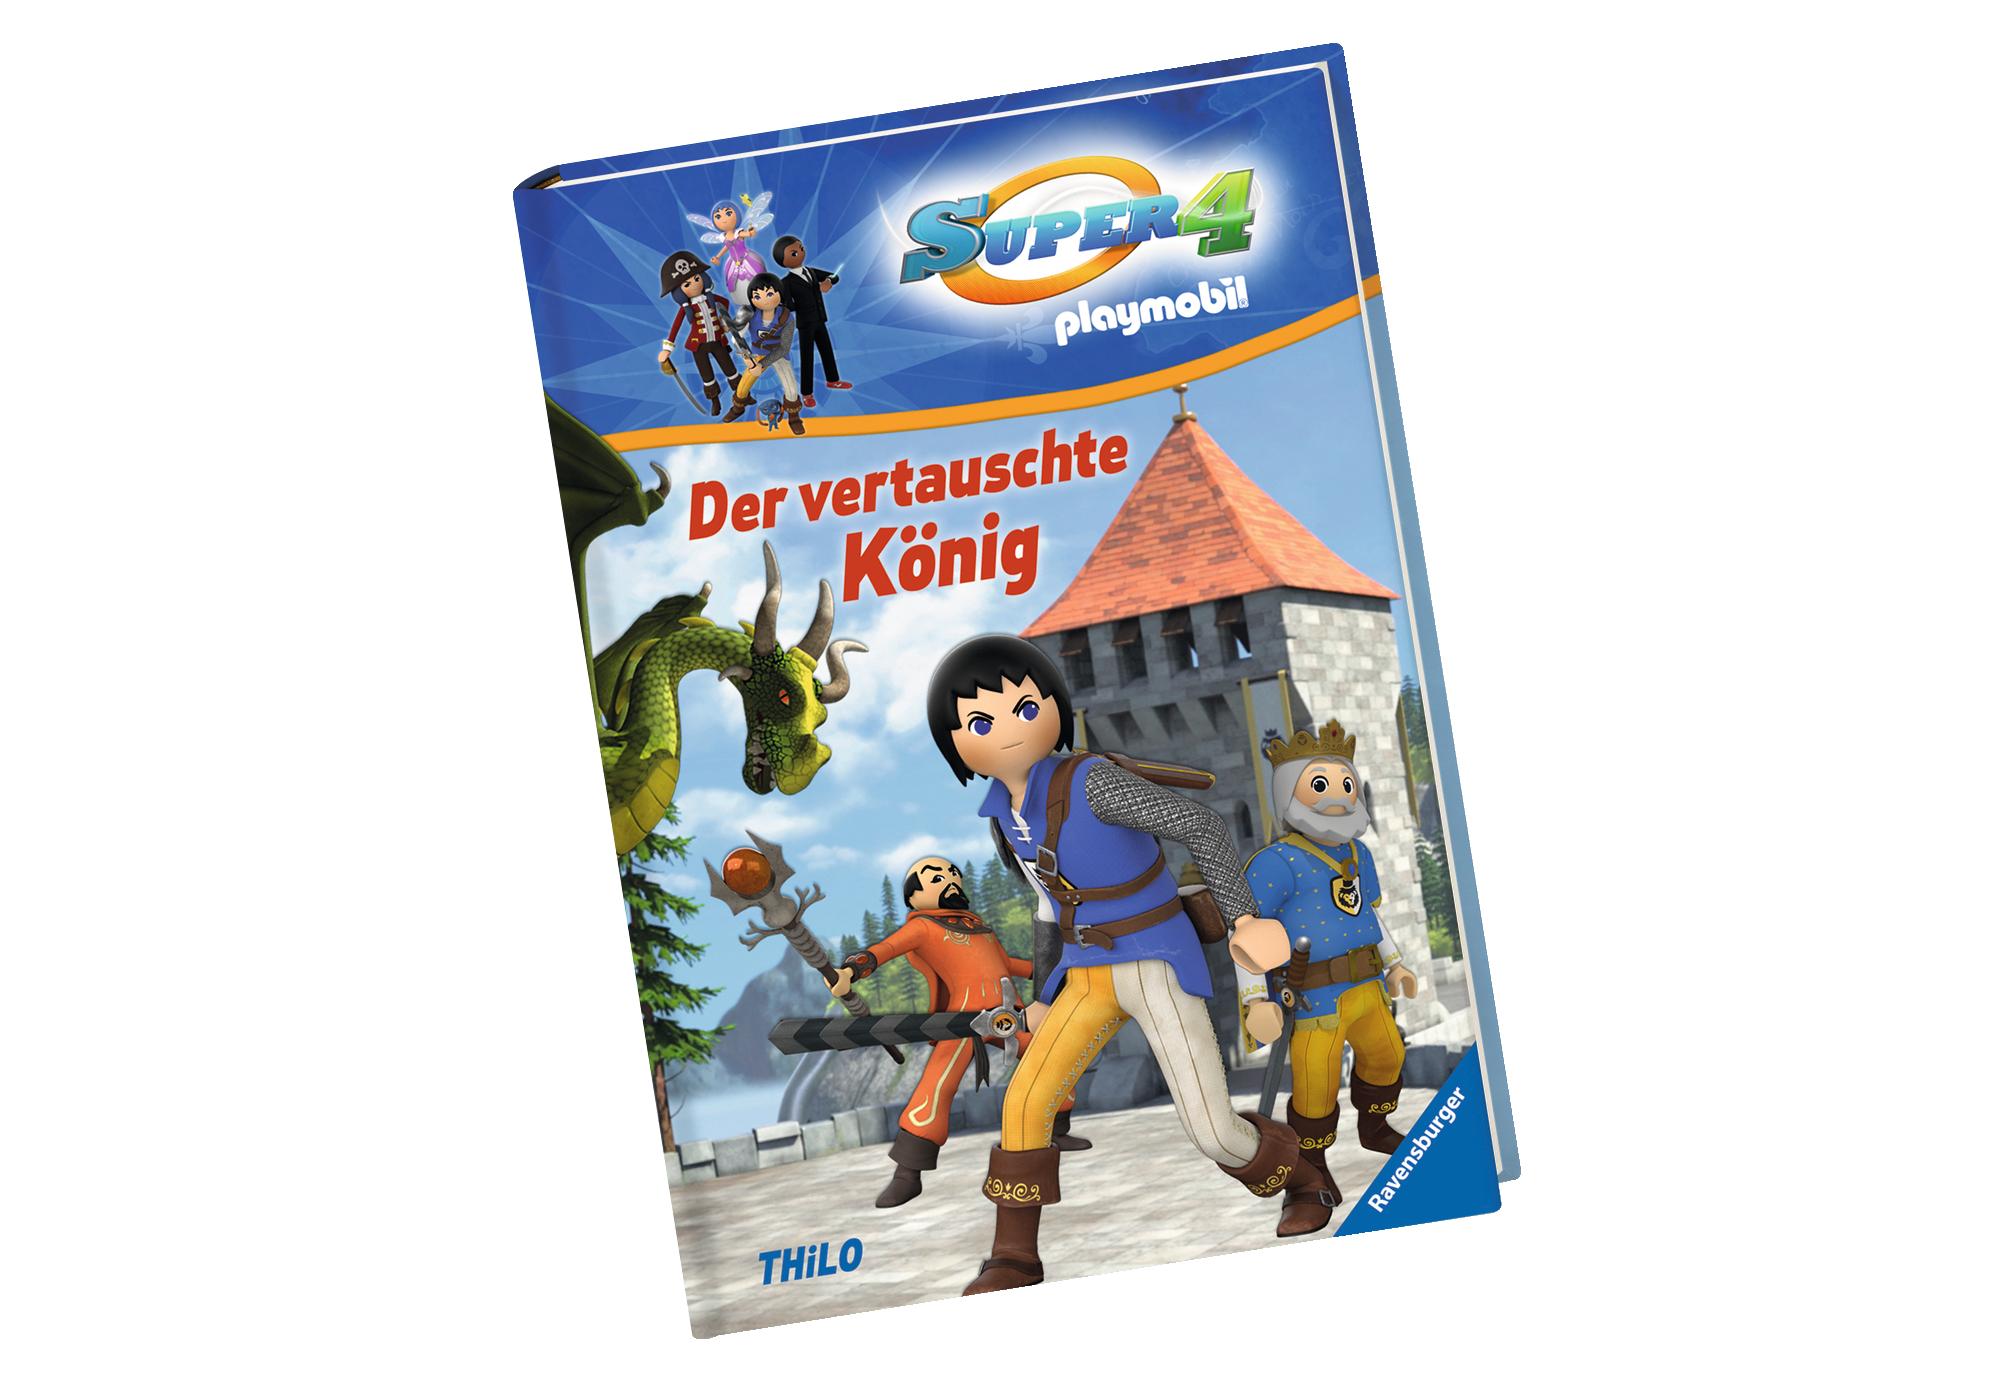 http://media.playmobil.com/i/playmobil/80470_product_detail/Super 4: Erstleser - Der vertauschte König